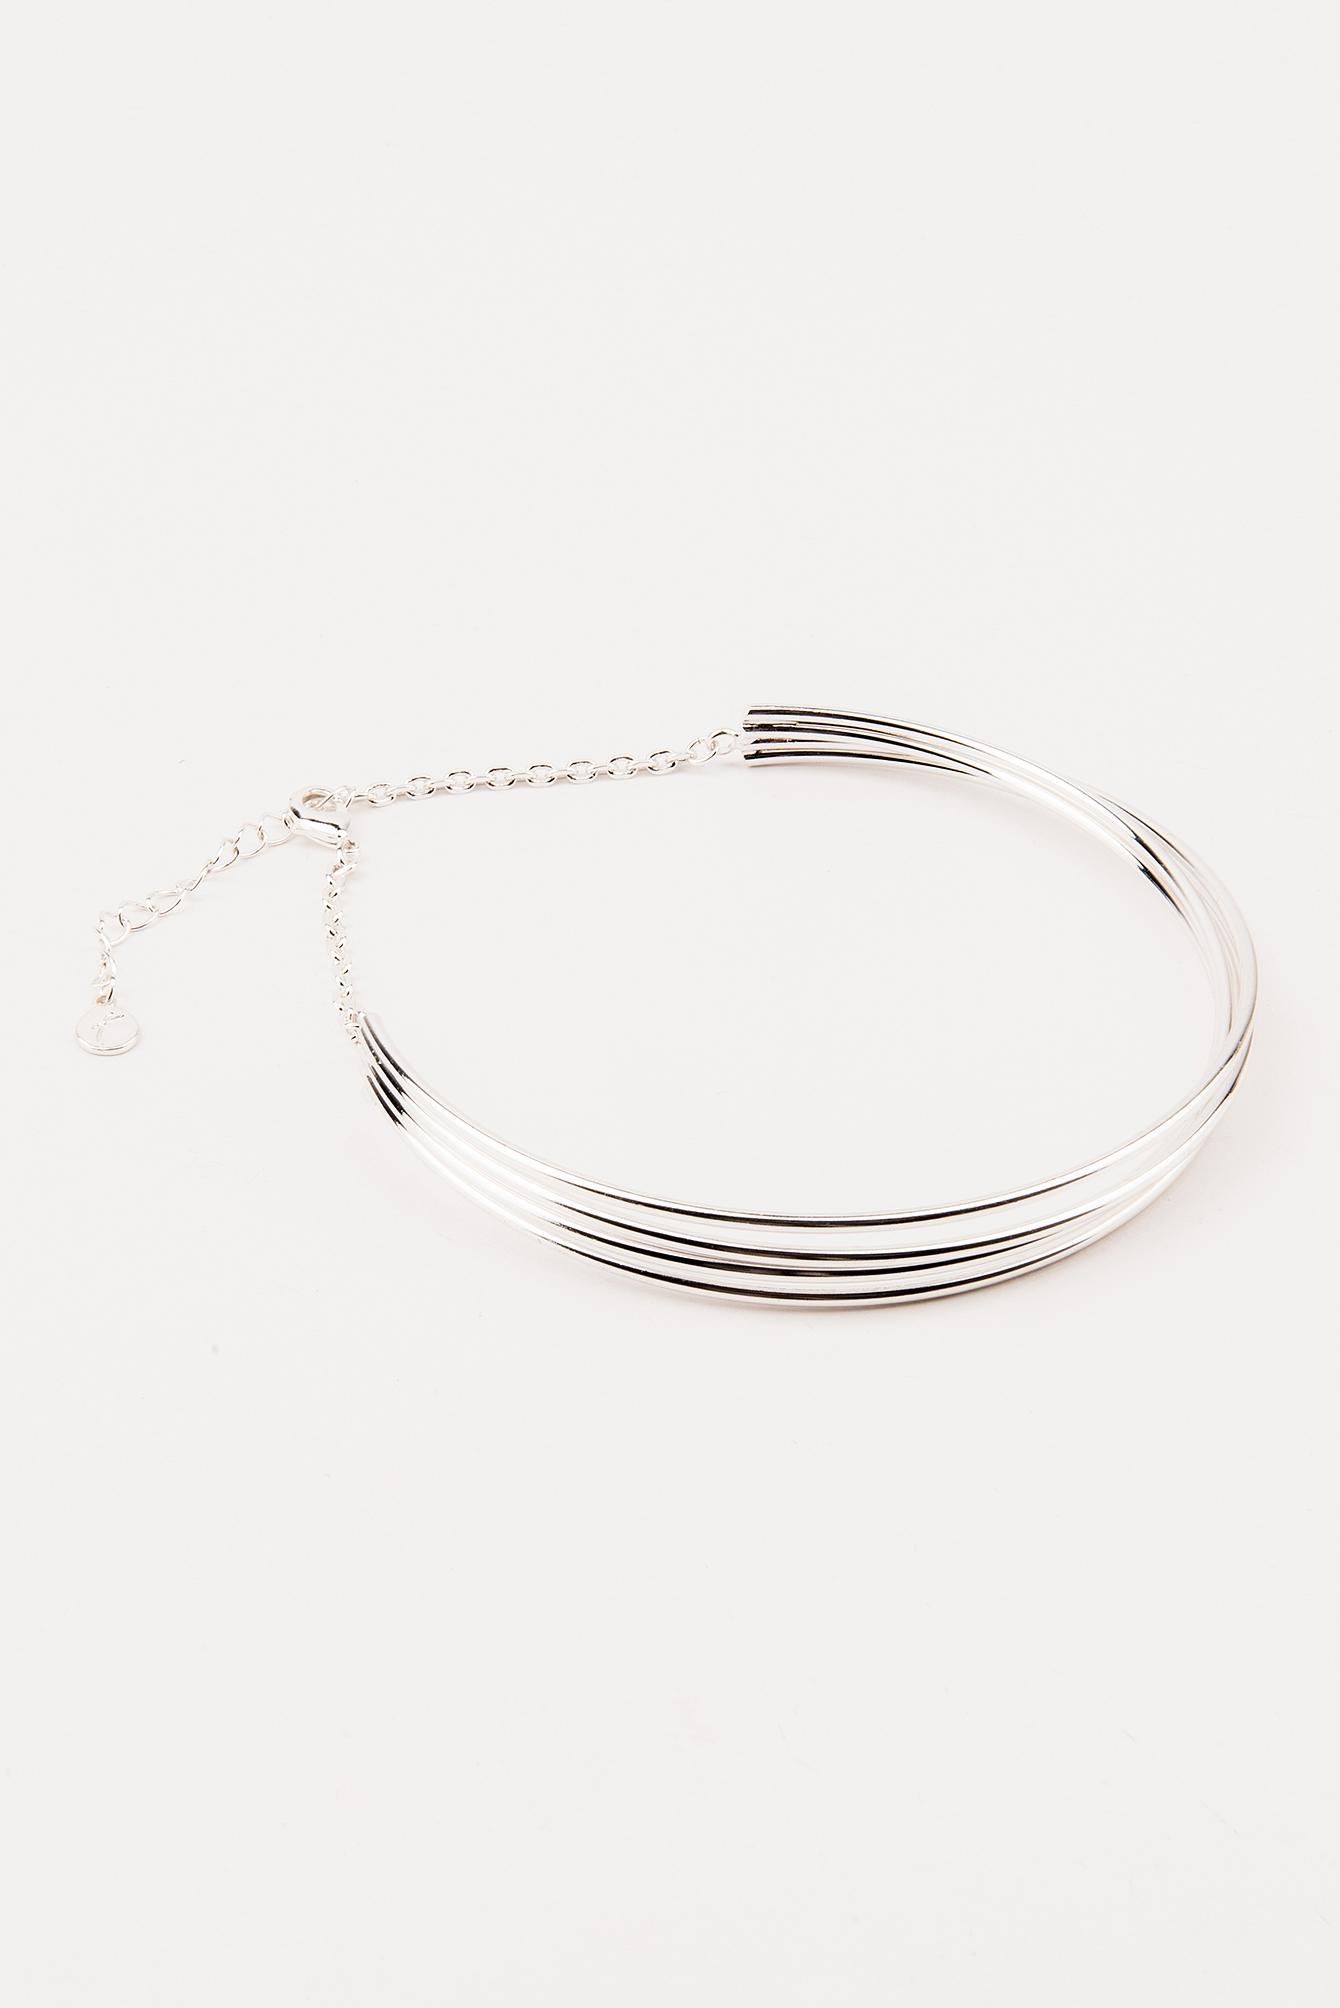 Tranloev Layered Choker - Silver